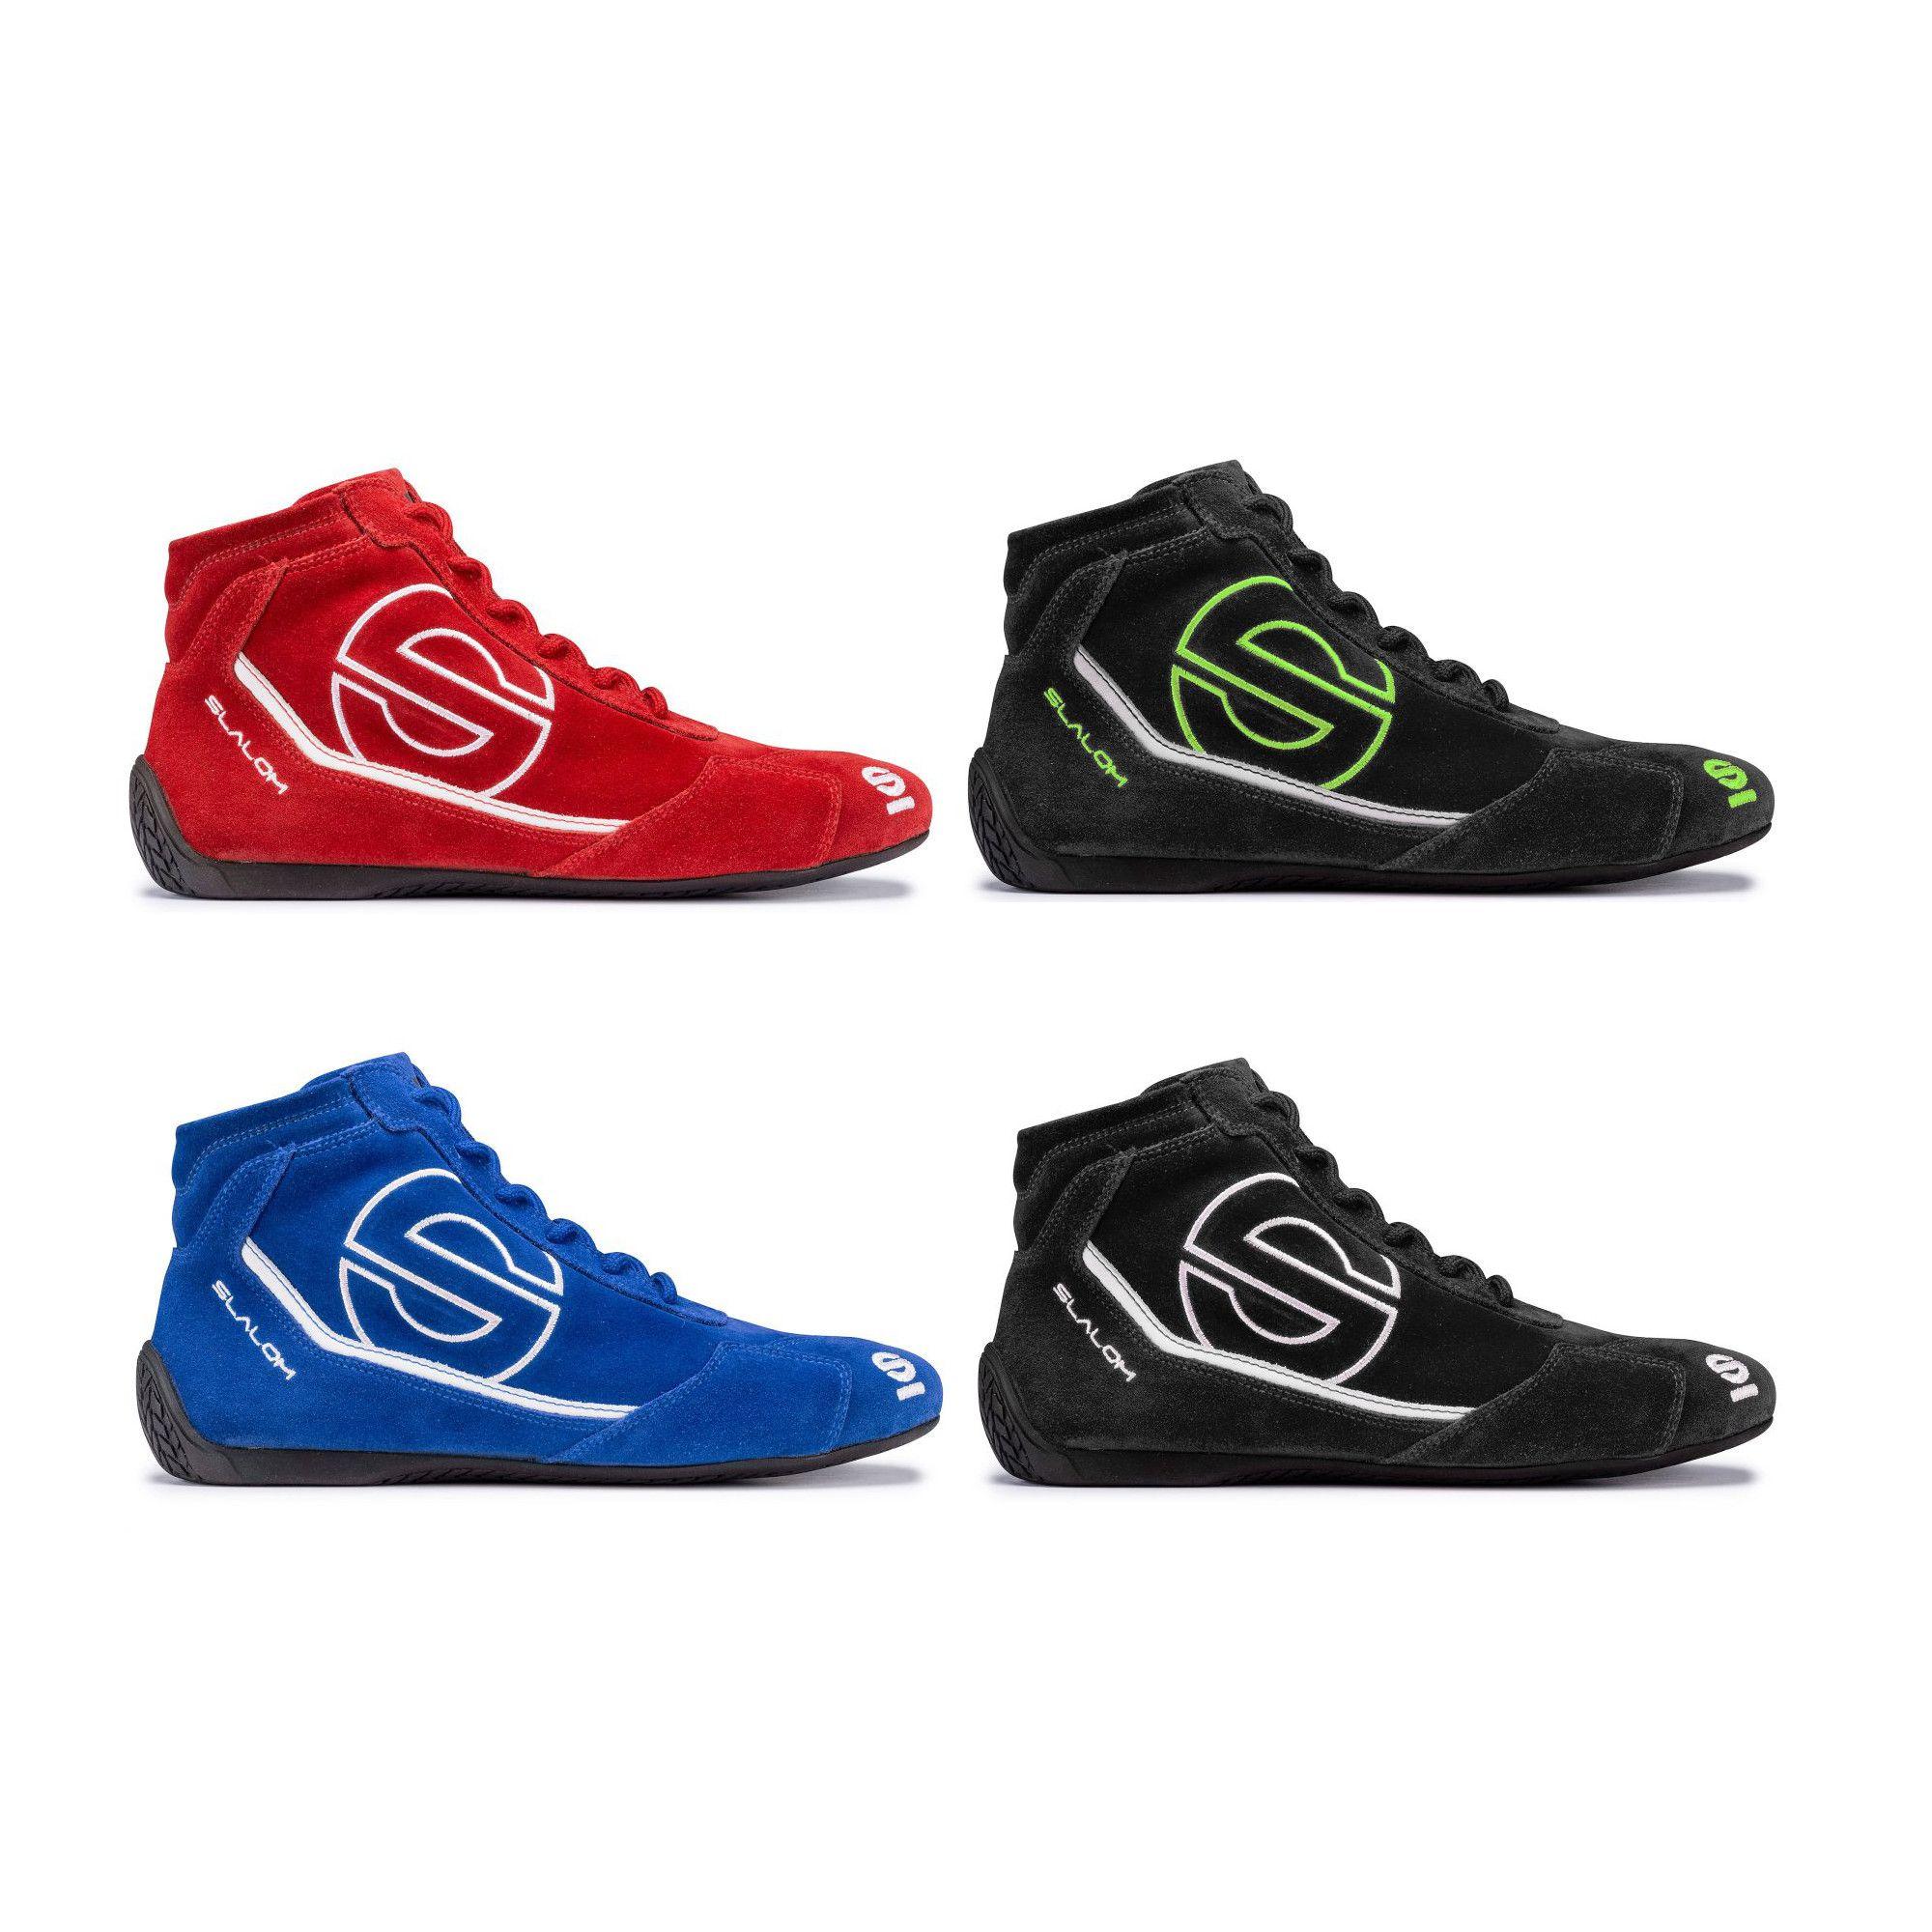 chaussures rallye en vente | eBay